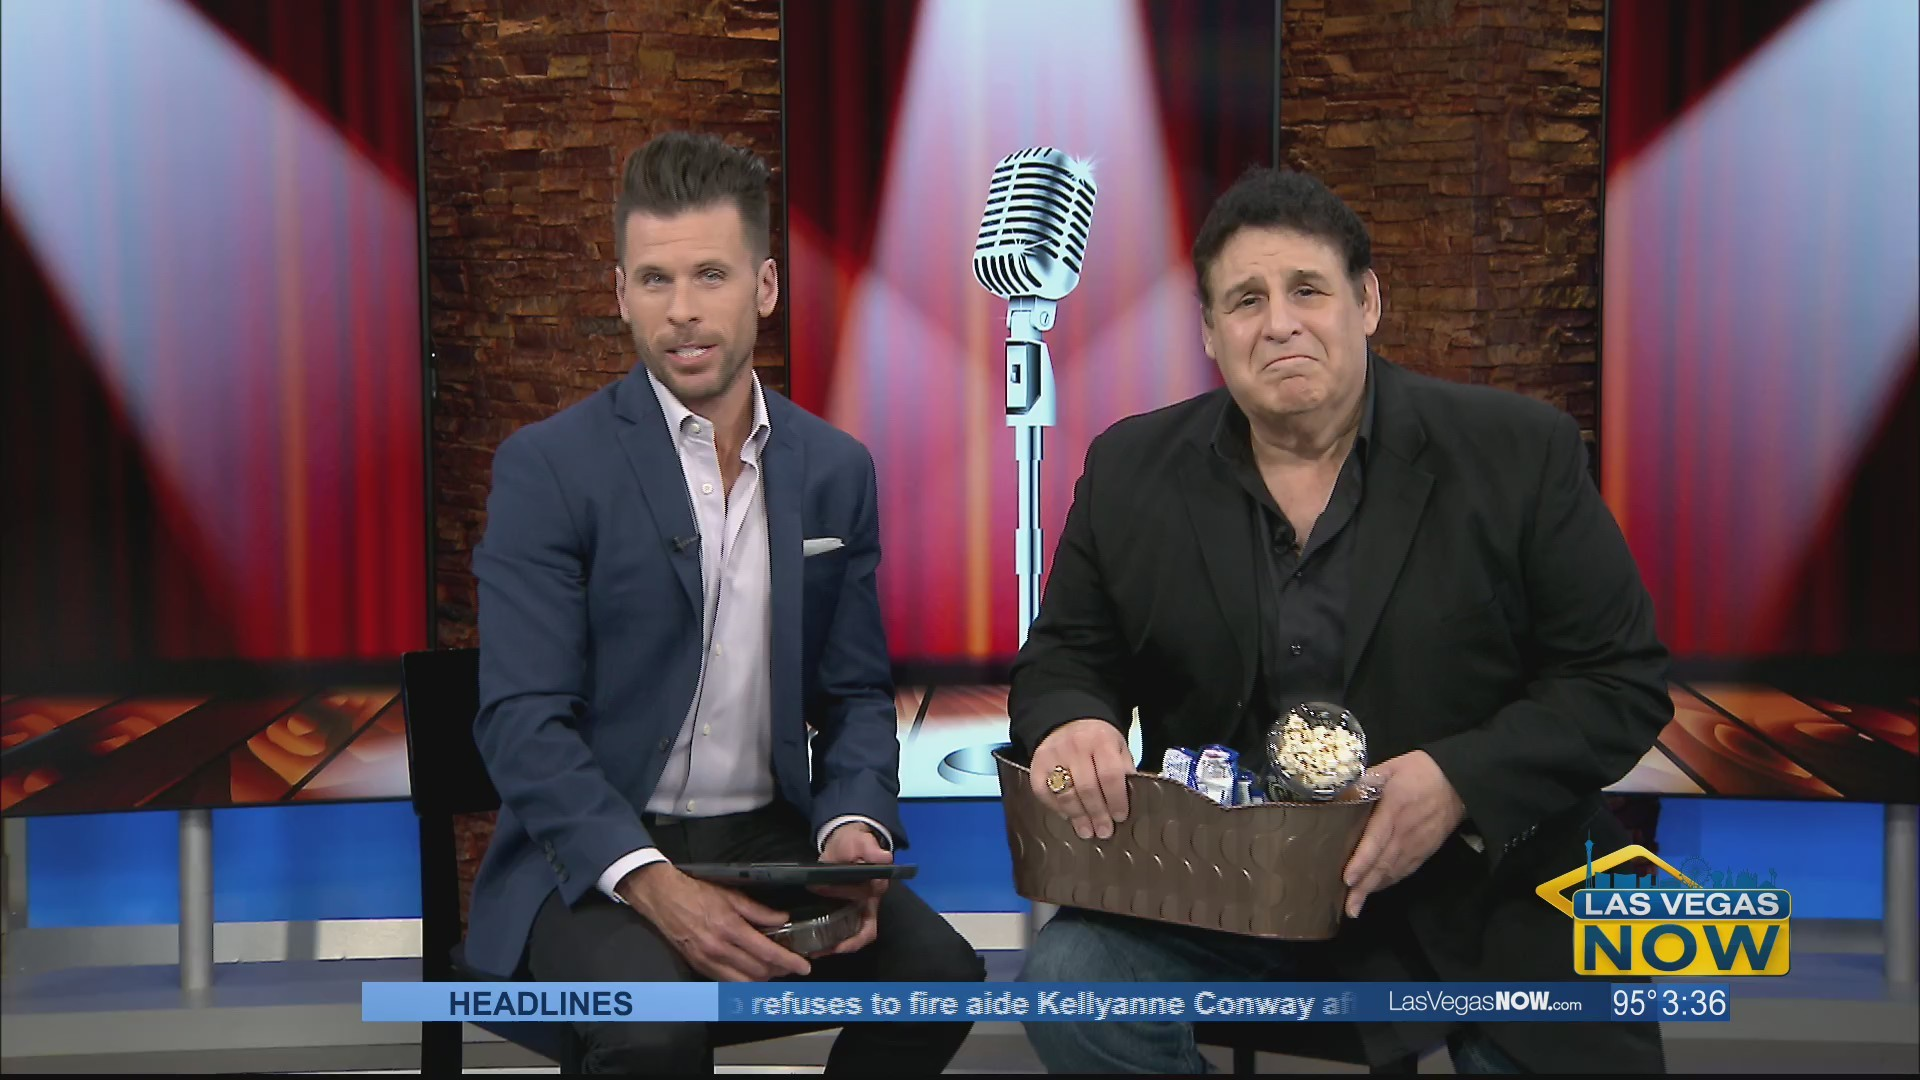 Greek comedy takes over Las Vegas